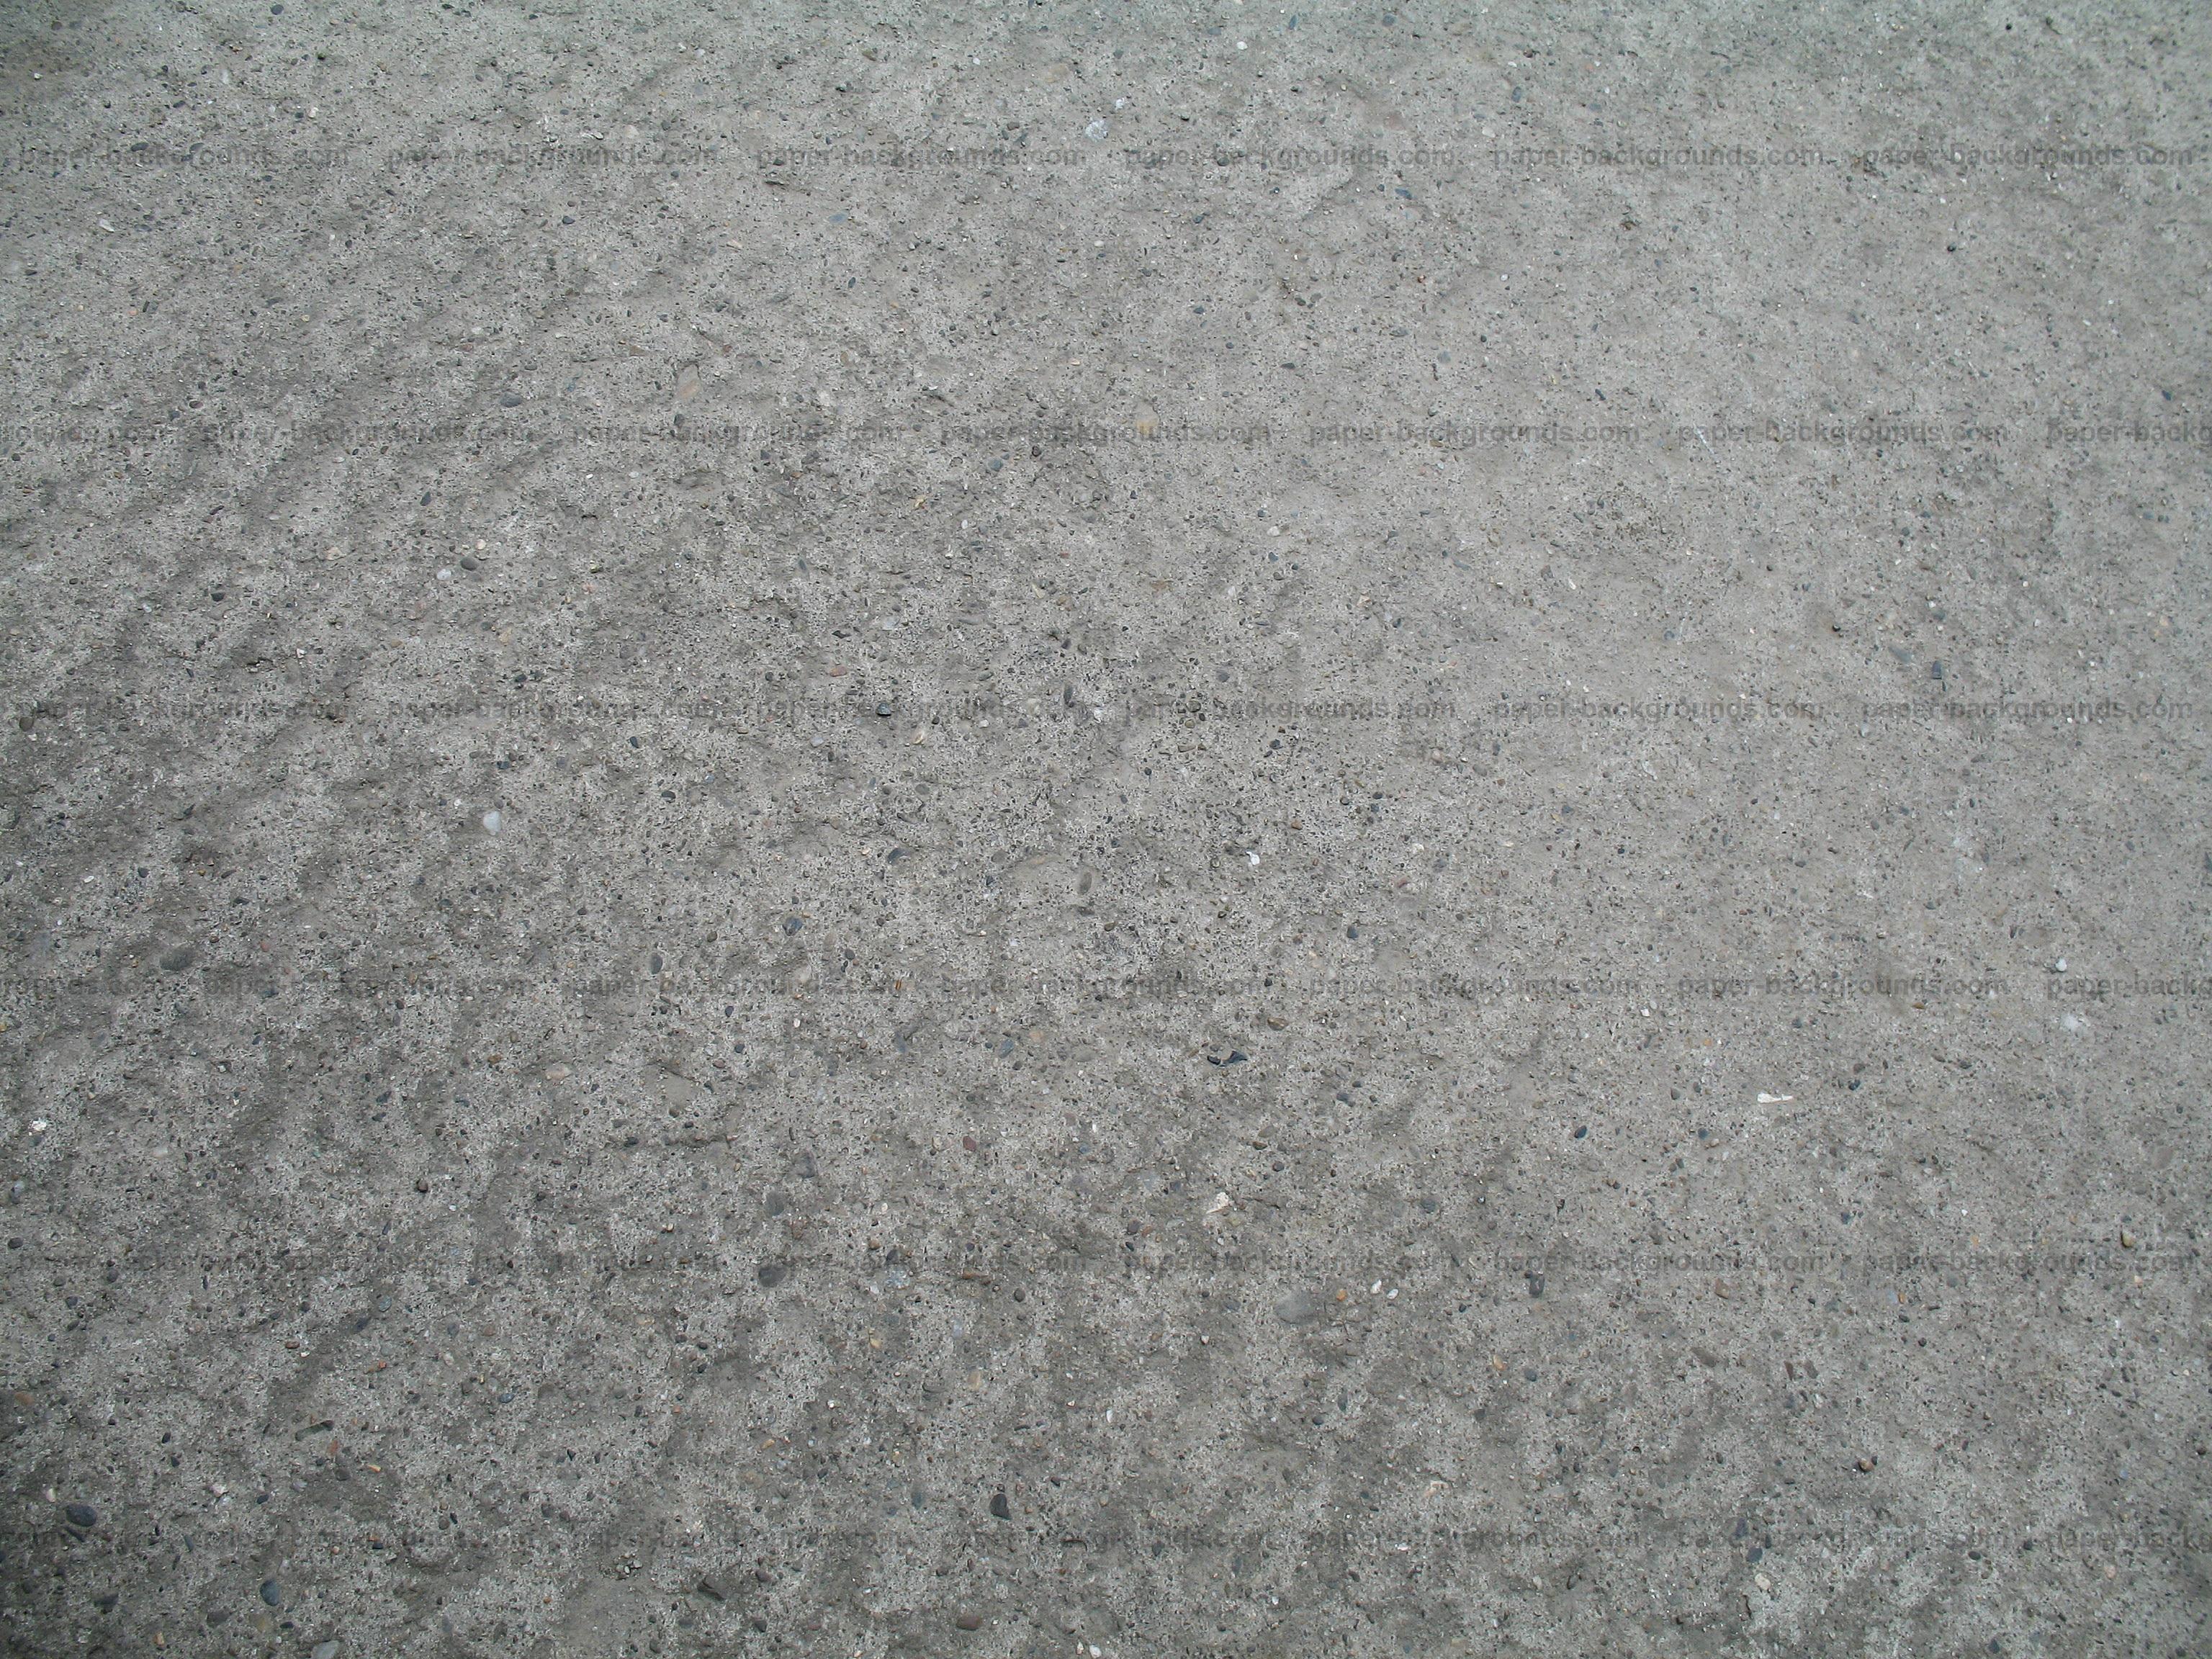 Gray concrete texture photo